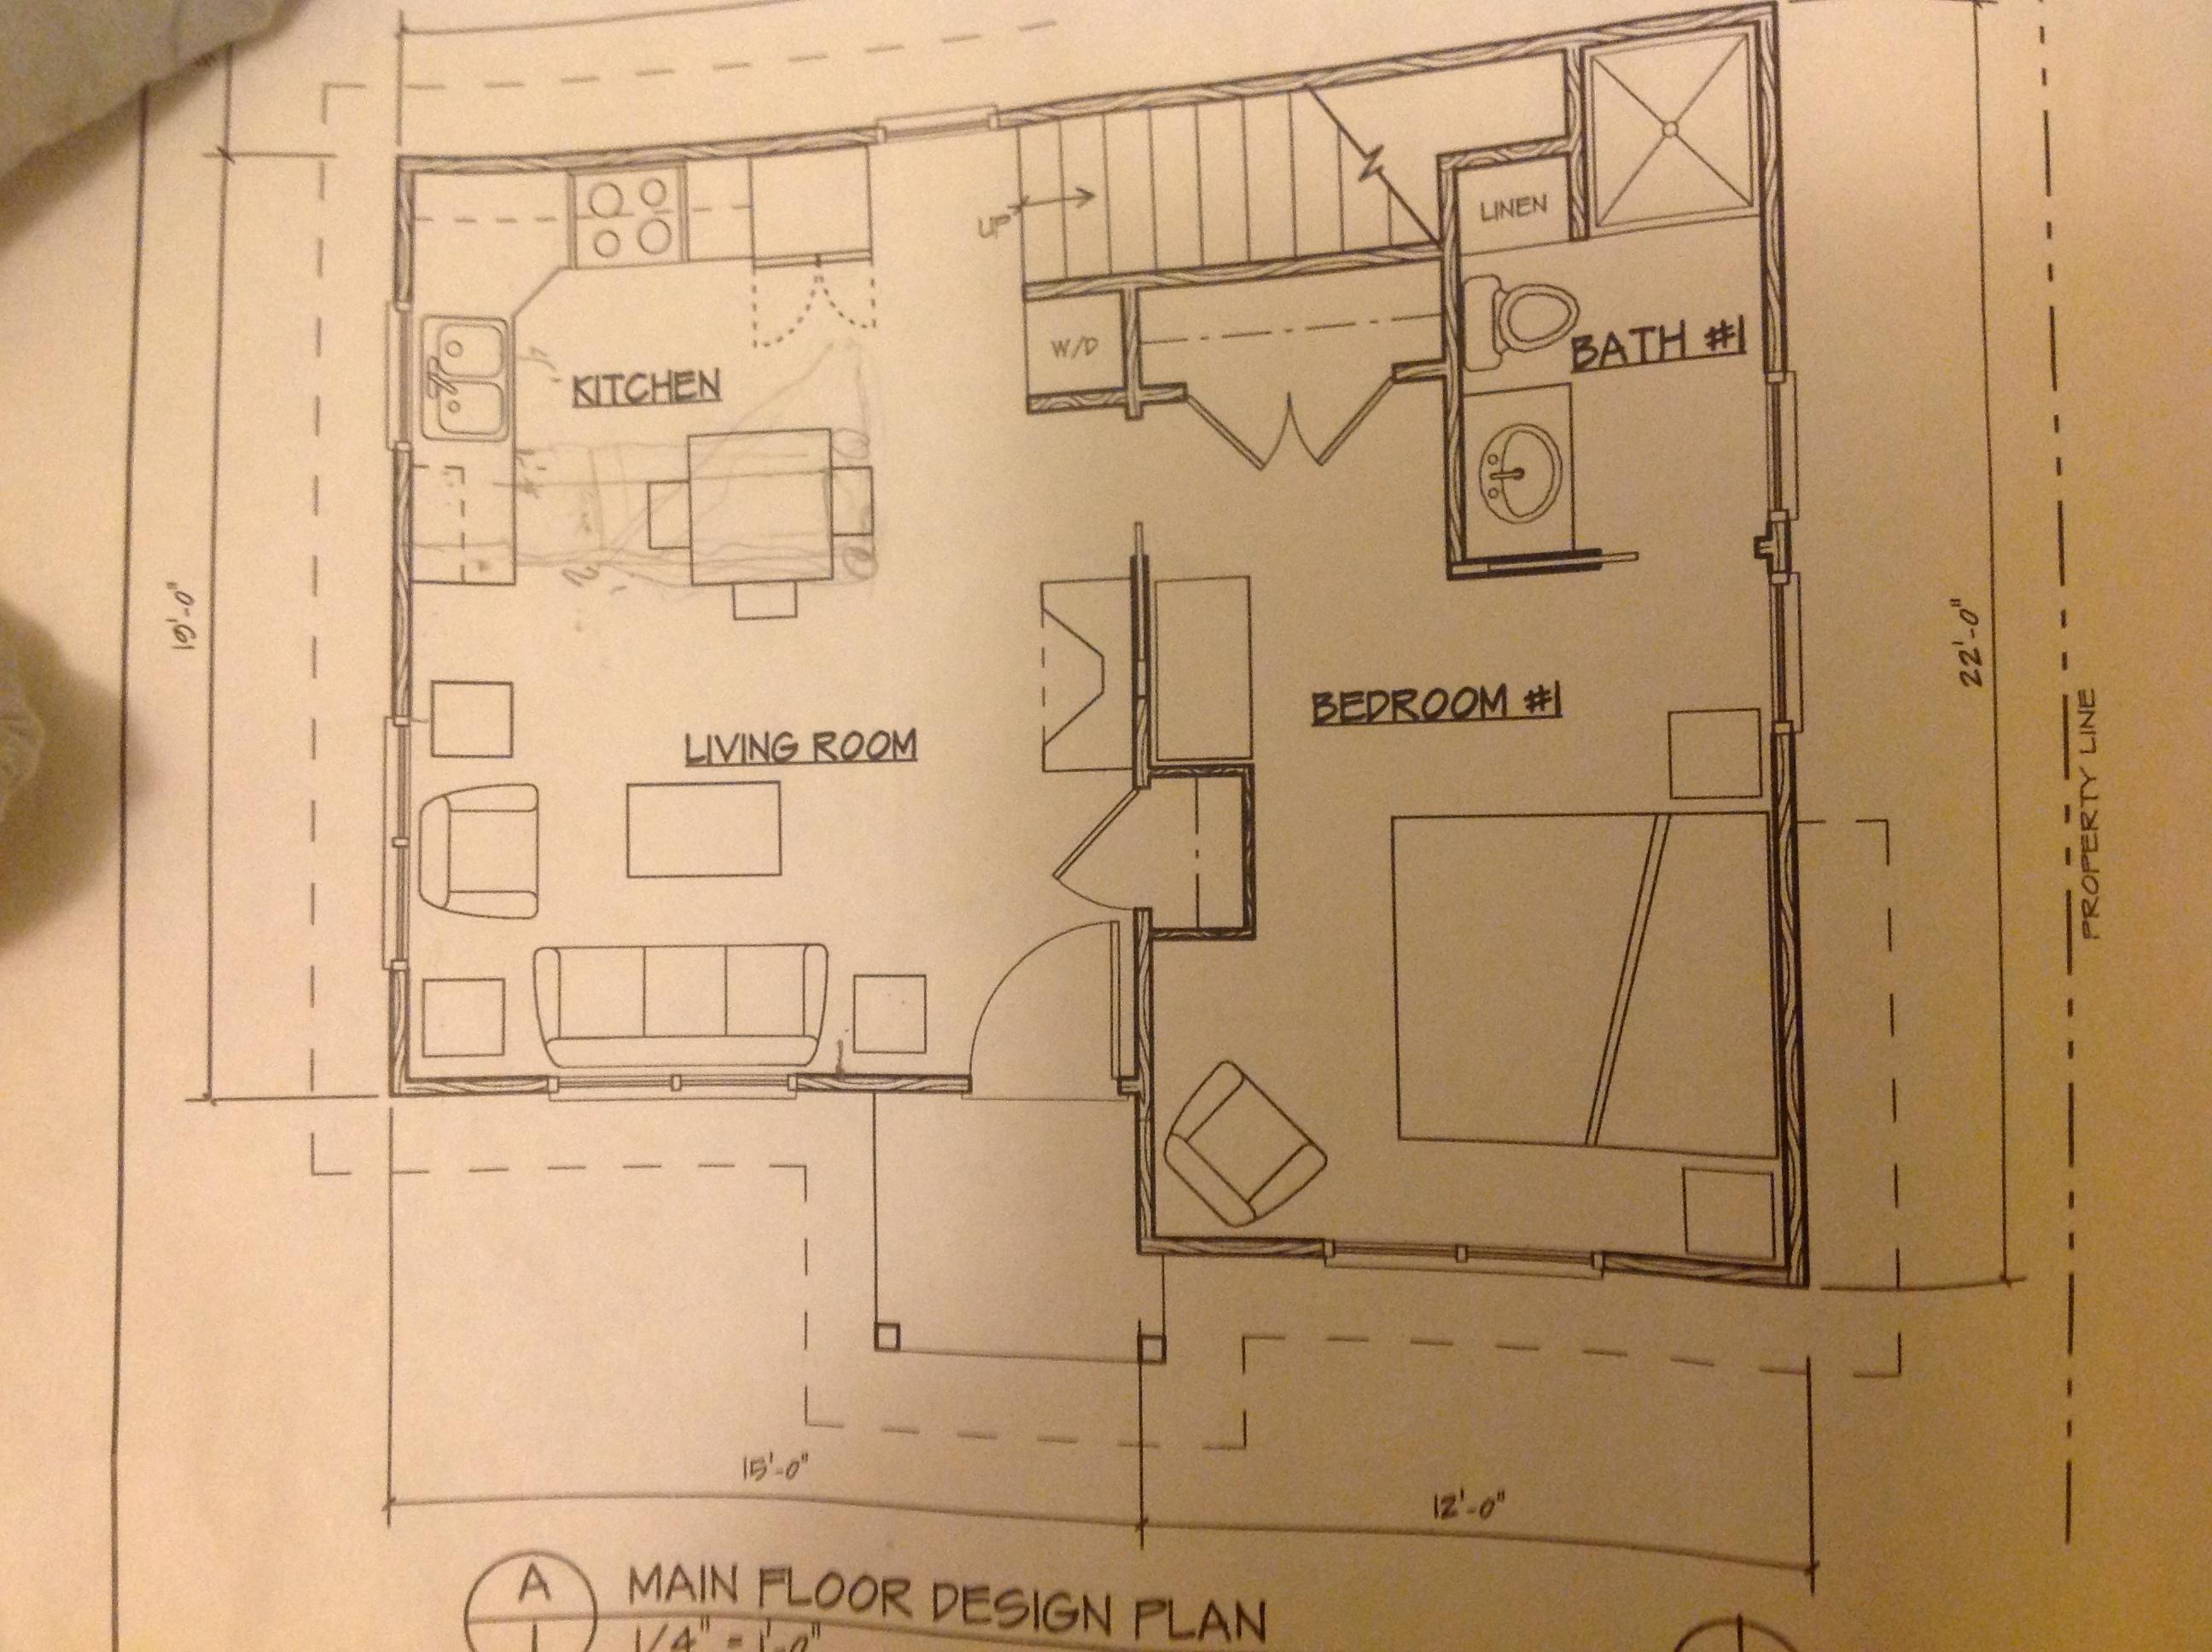 Scott powers adu first floor plan accessory dwellings for Adu floor plans